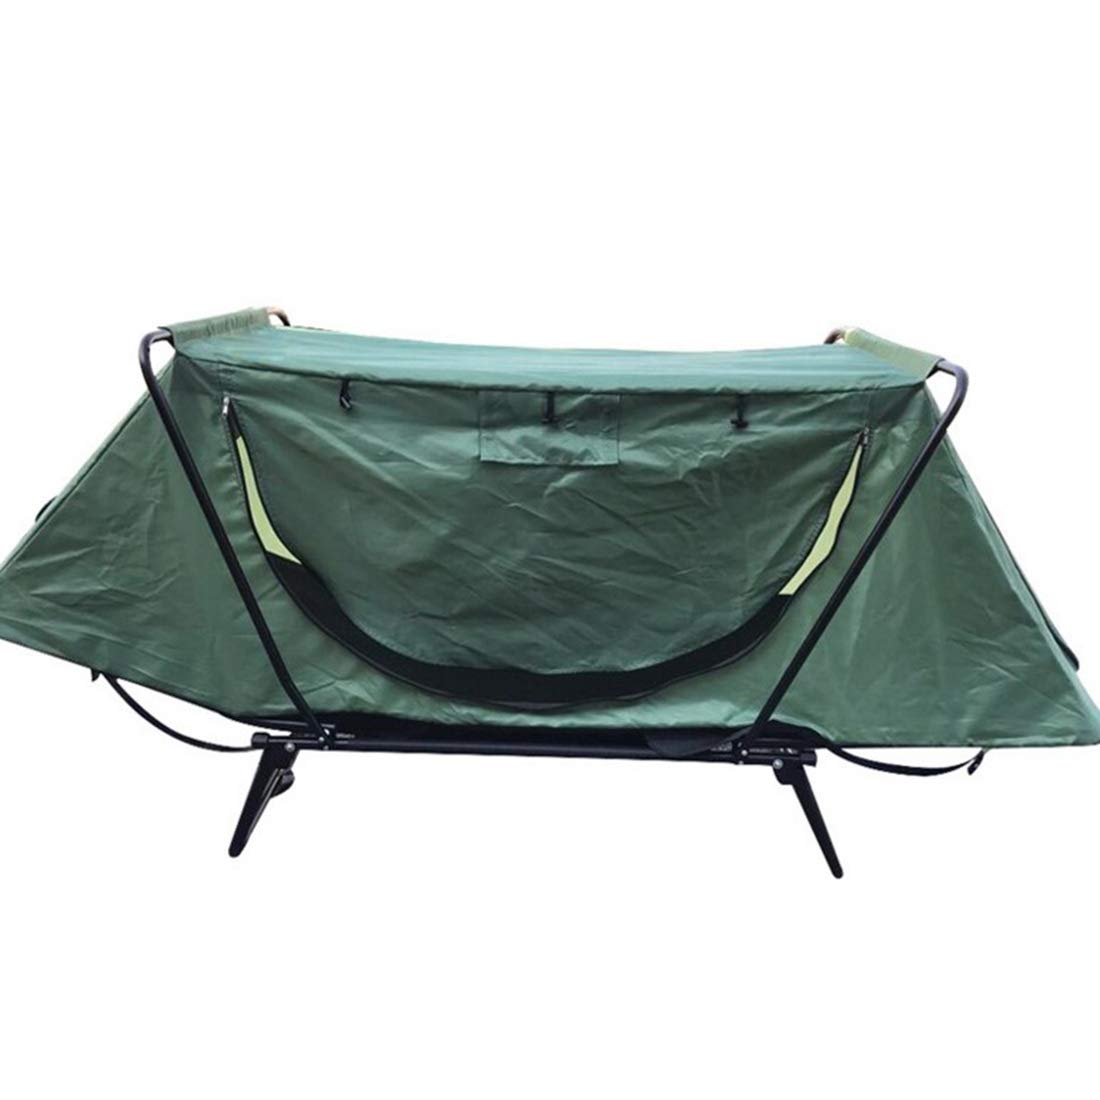 Sakuldes Mehrzweck-Outdoor-Freizeit-Campingzelt Free Fishing Field Supplies Off-Site-Zelt Bett (Farbe   Grün)